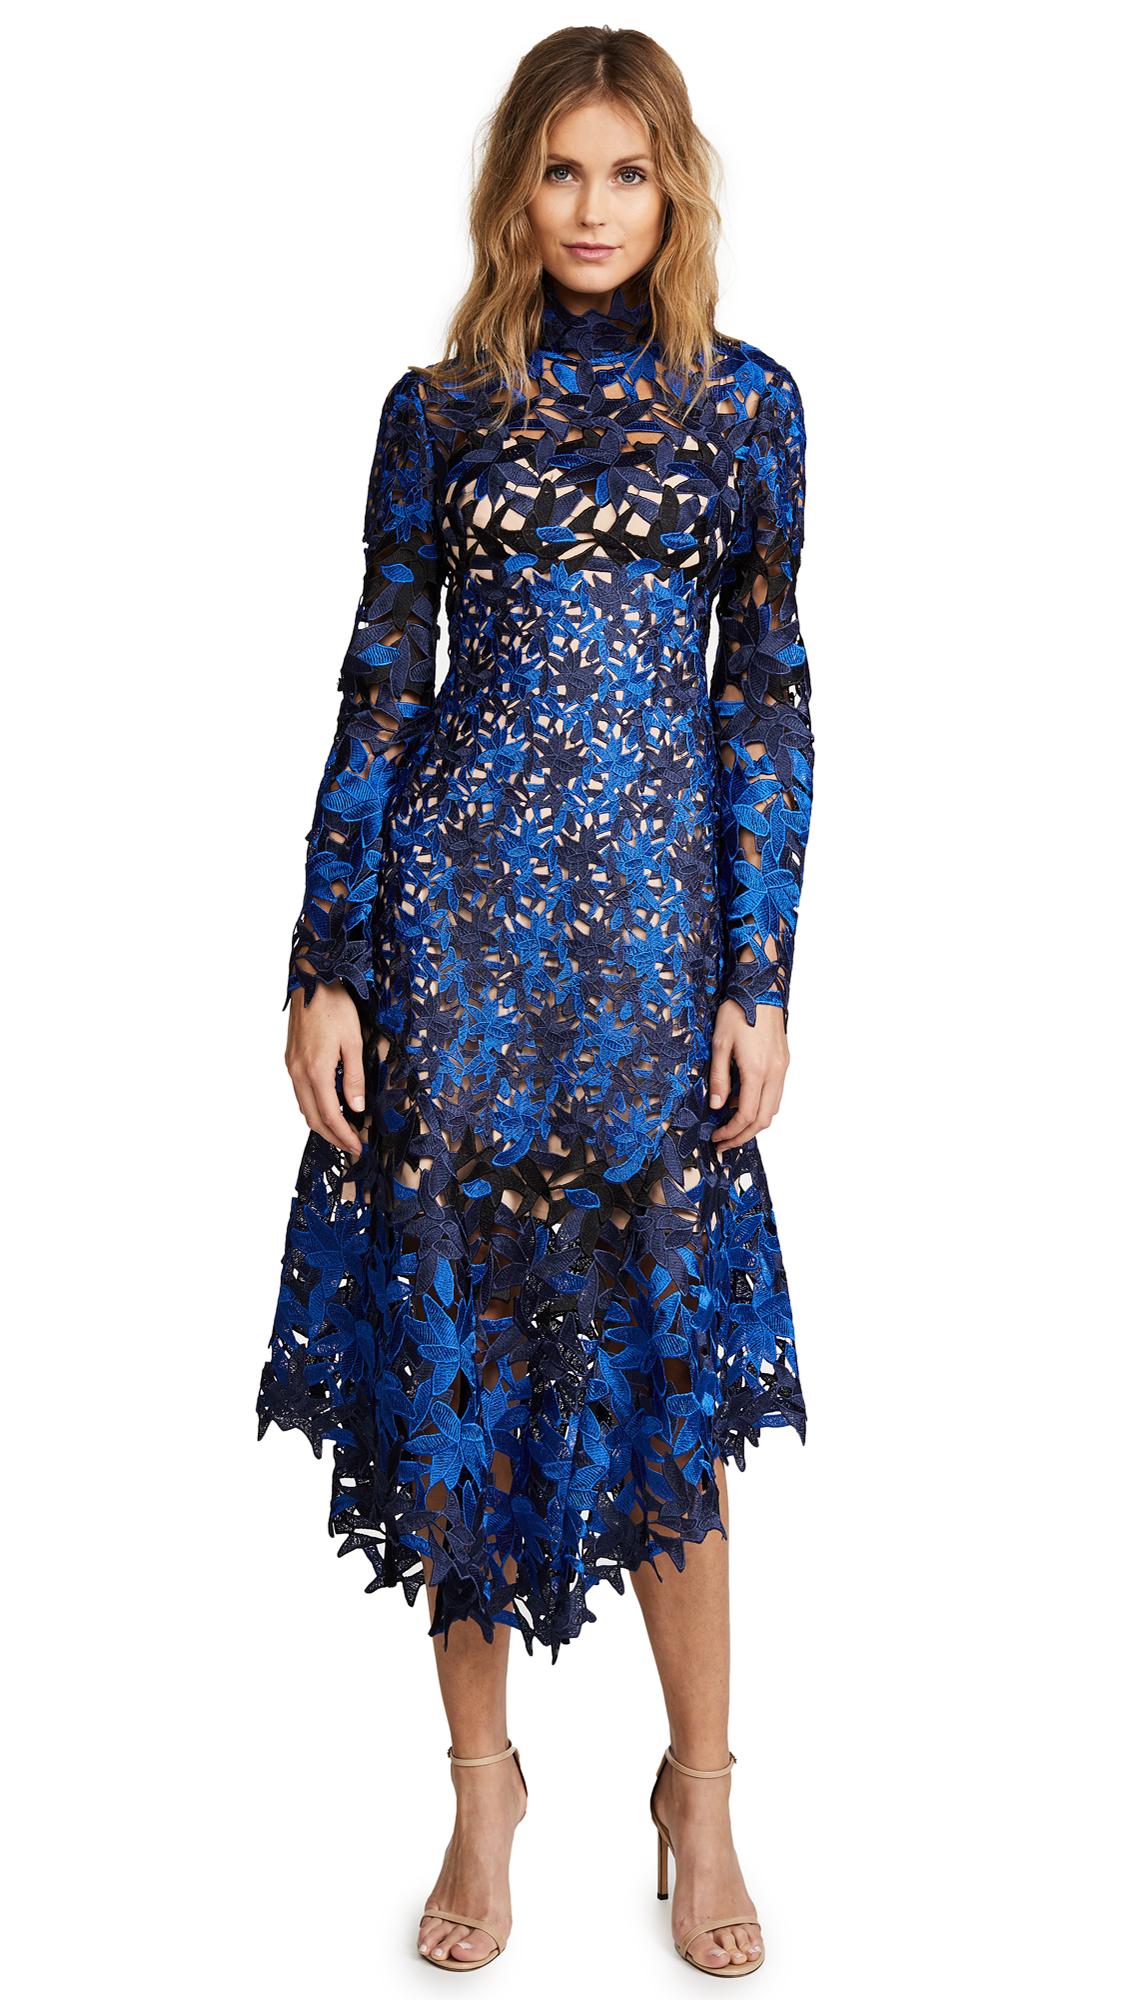 Acler Davis Lace Dress